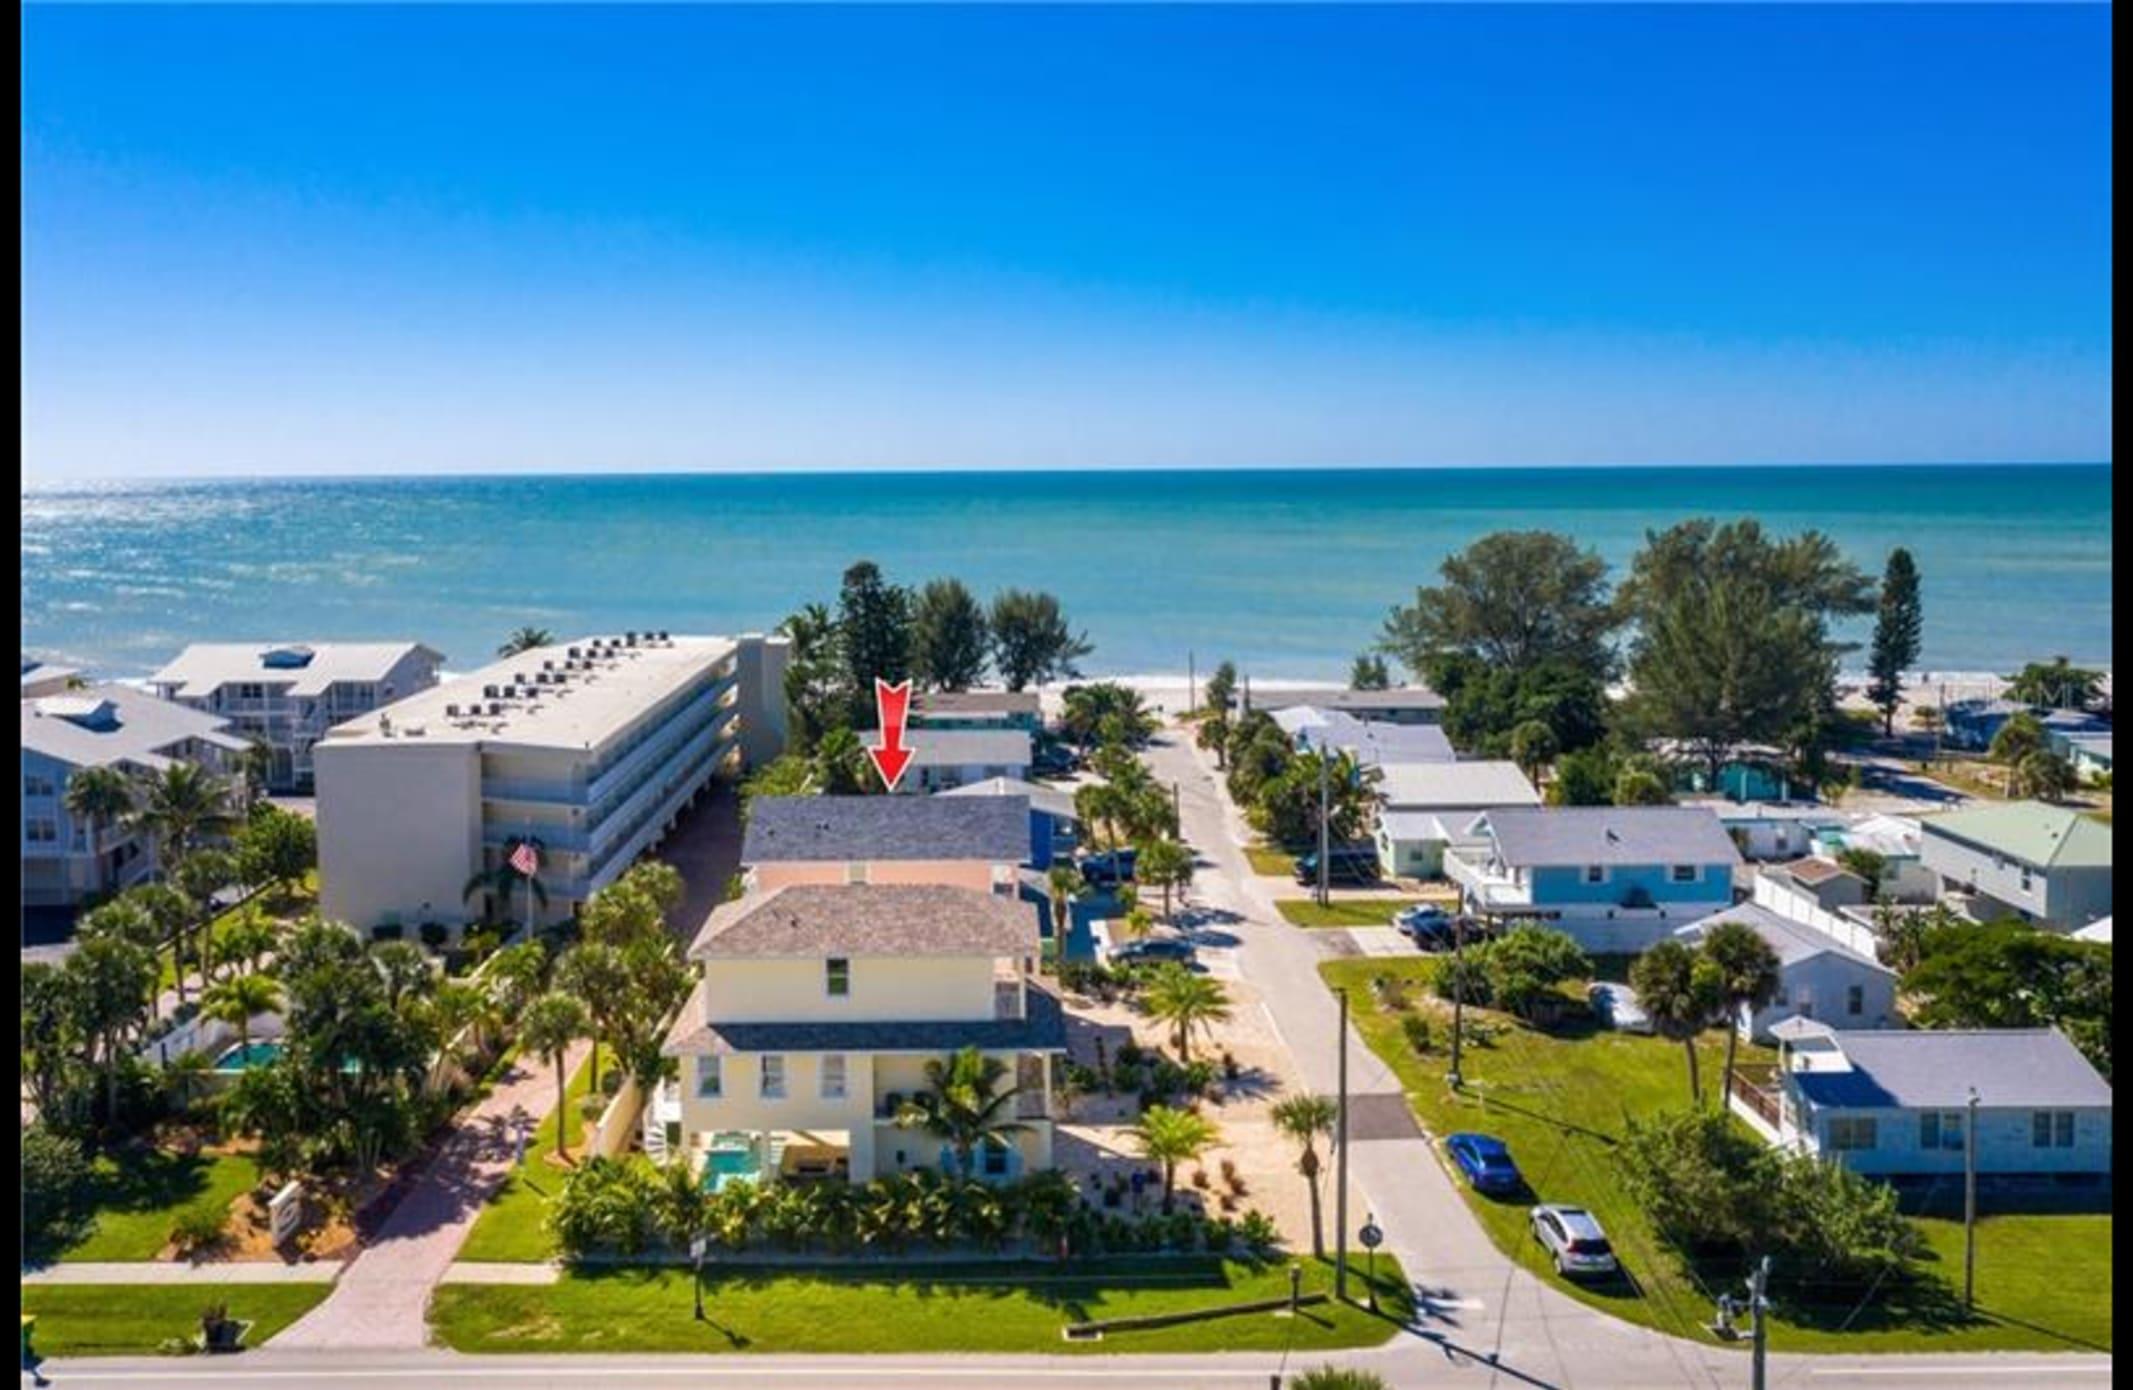 85 SAND DOLLAR LANE - Luxury Listings. Englewood, FL ...